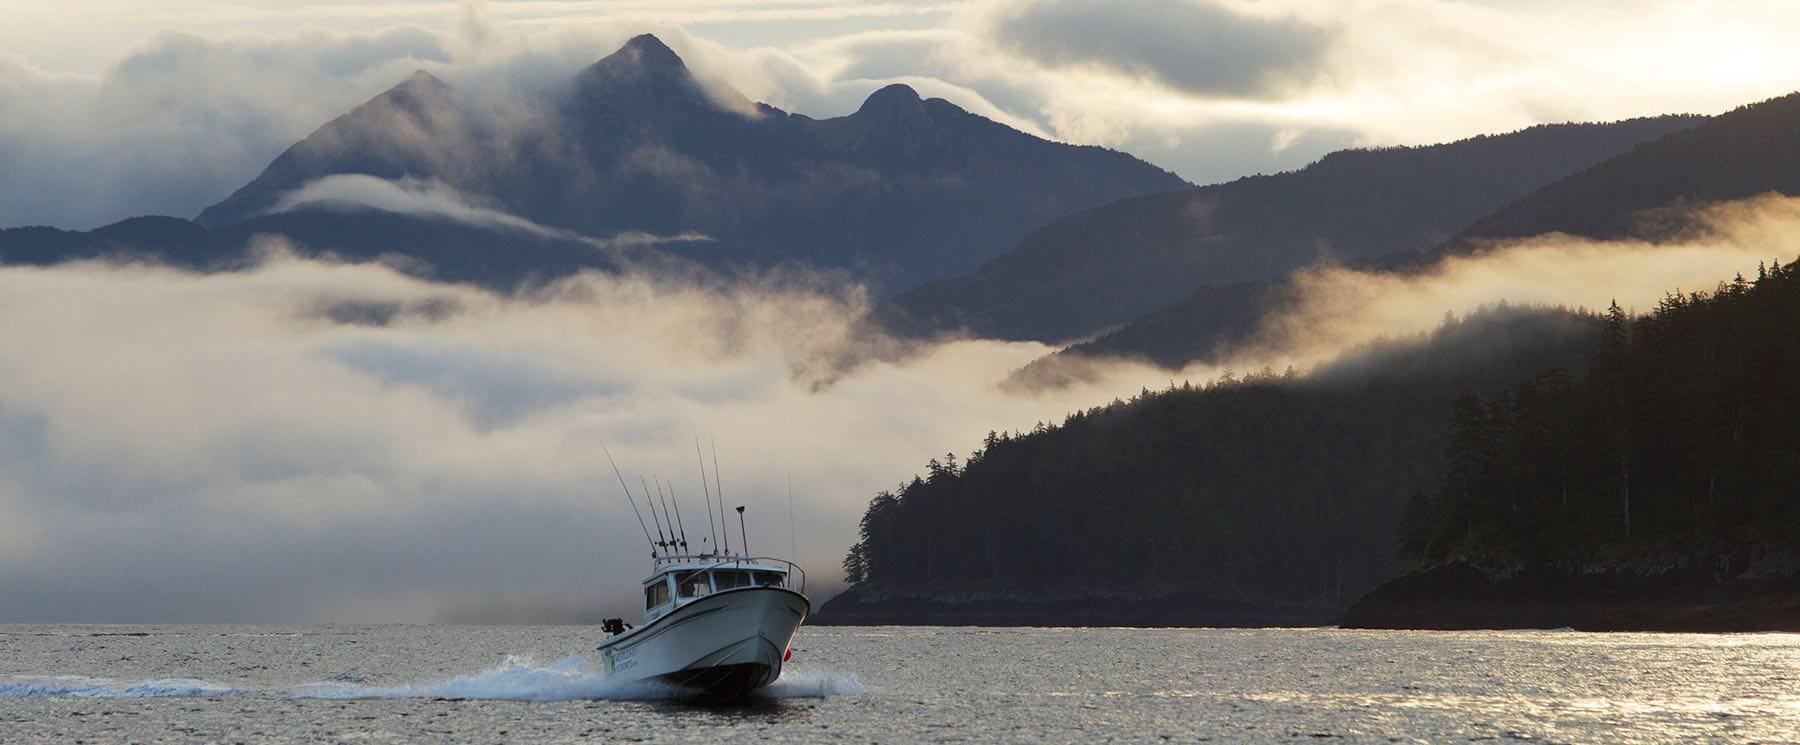 Saltwater fishing boat in haida gwaii british columbia canada